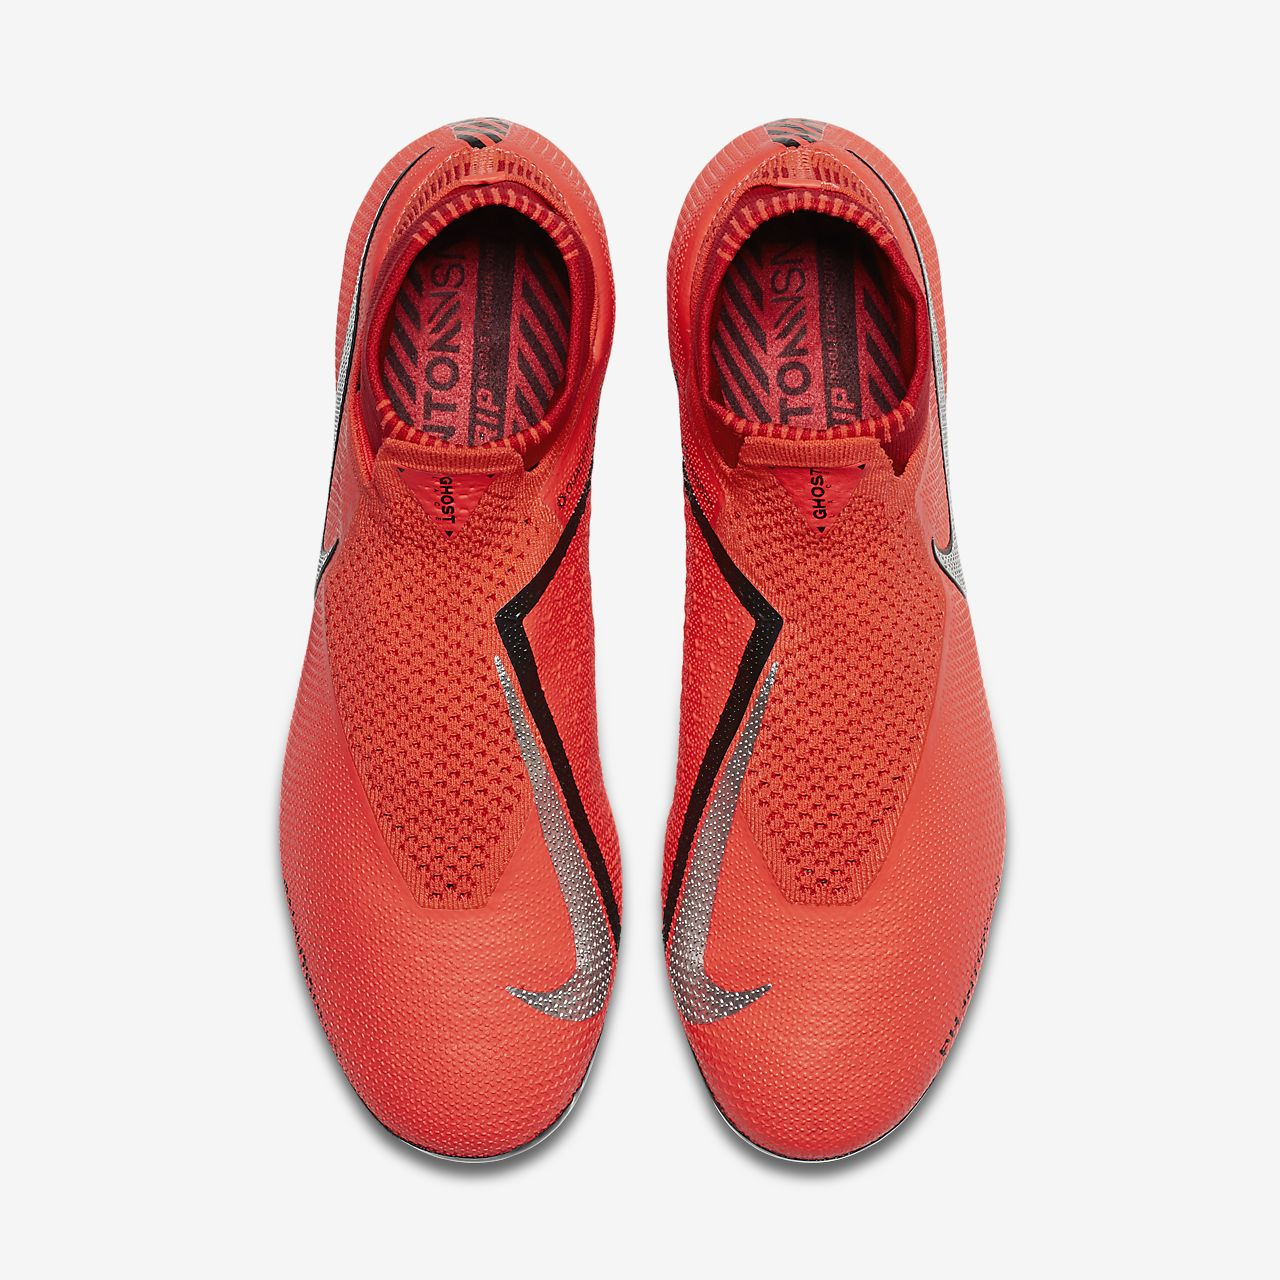 2f1ffa666003 ... Nike Phantom Vision Elite Dynamic Fit Artificial-Grass Football Boot